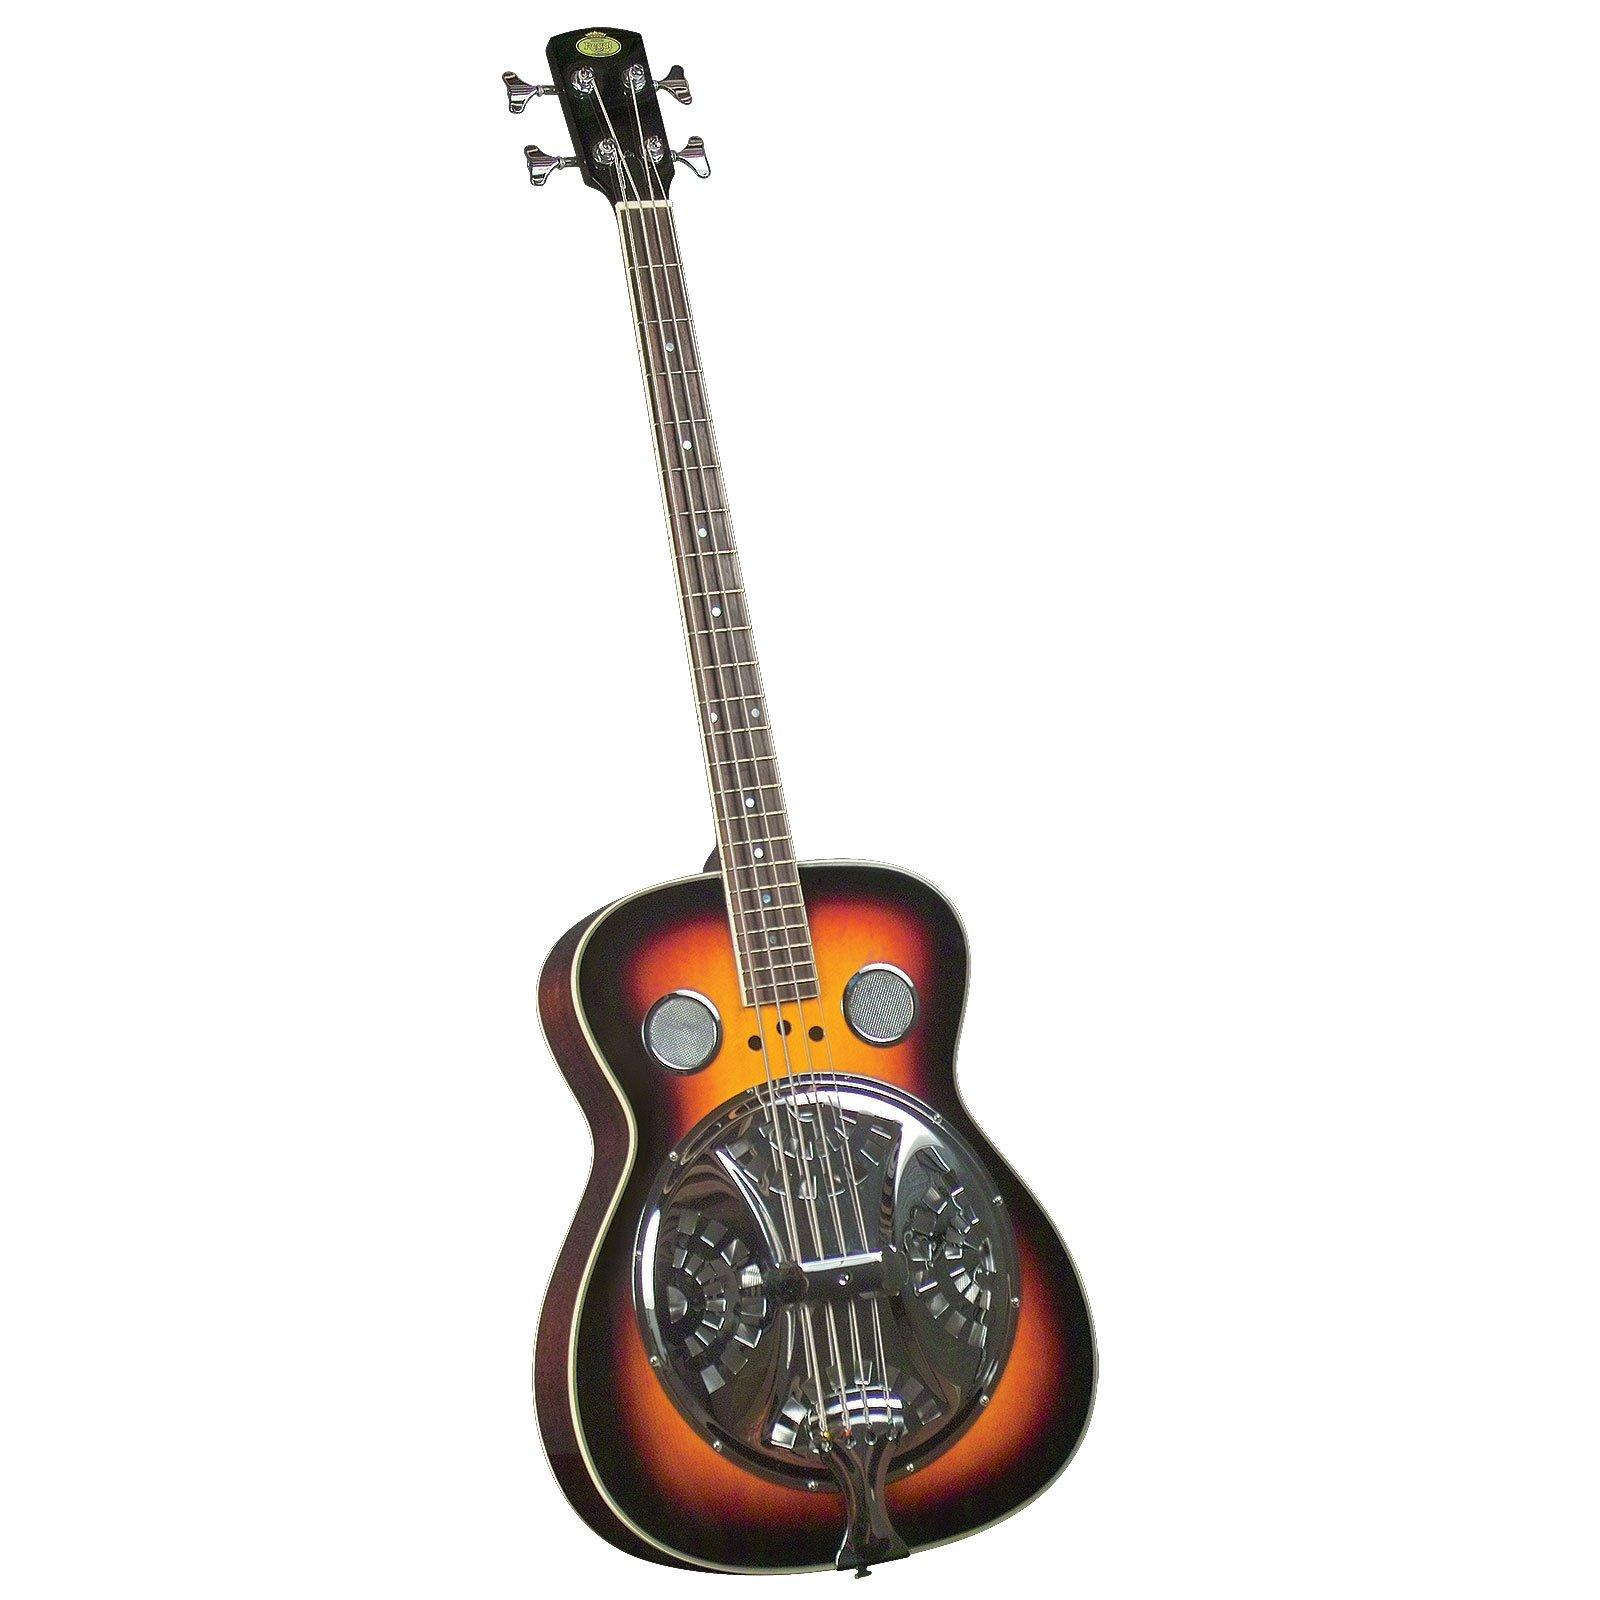 Regal RD-05 Studio Series Resophonic Bass